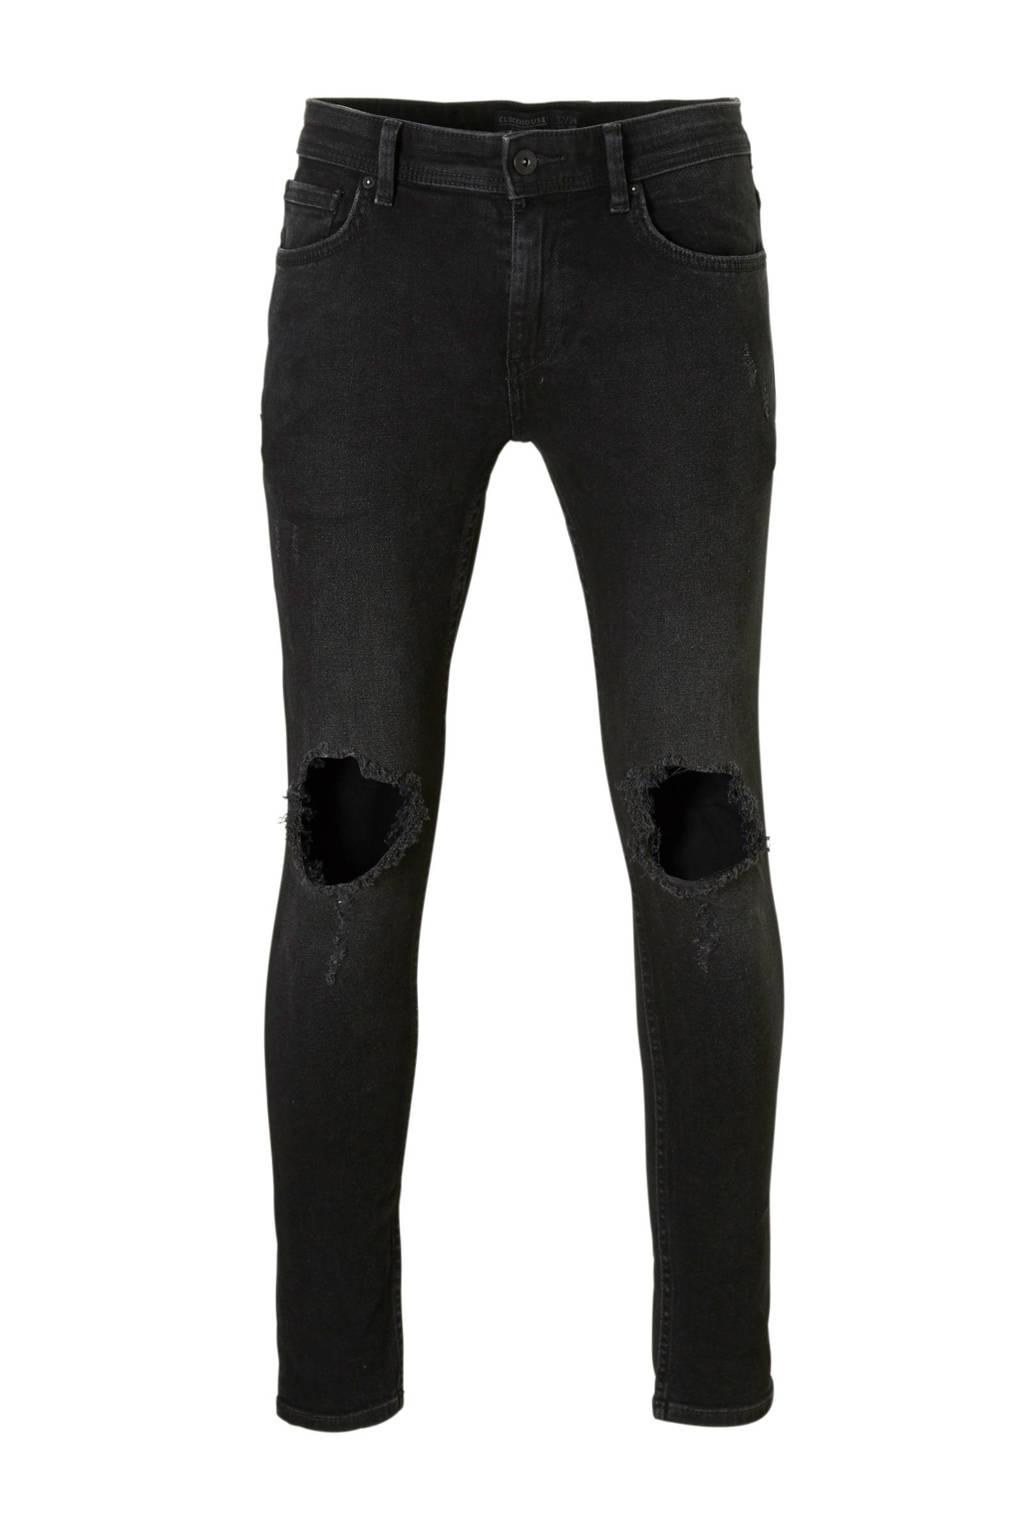 C&A Clockhouse skinny jeans zwart (heren), Zwart